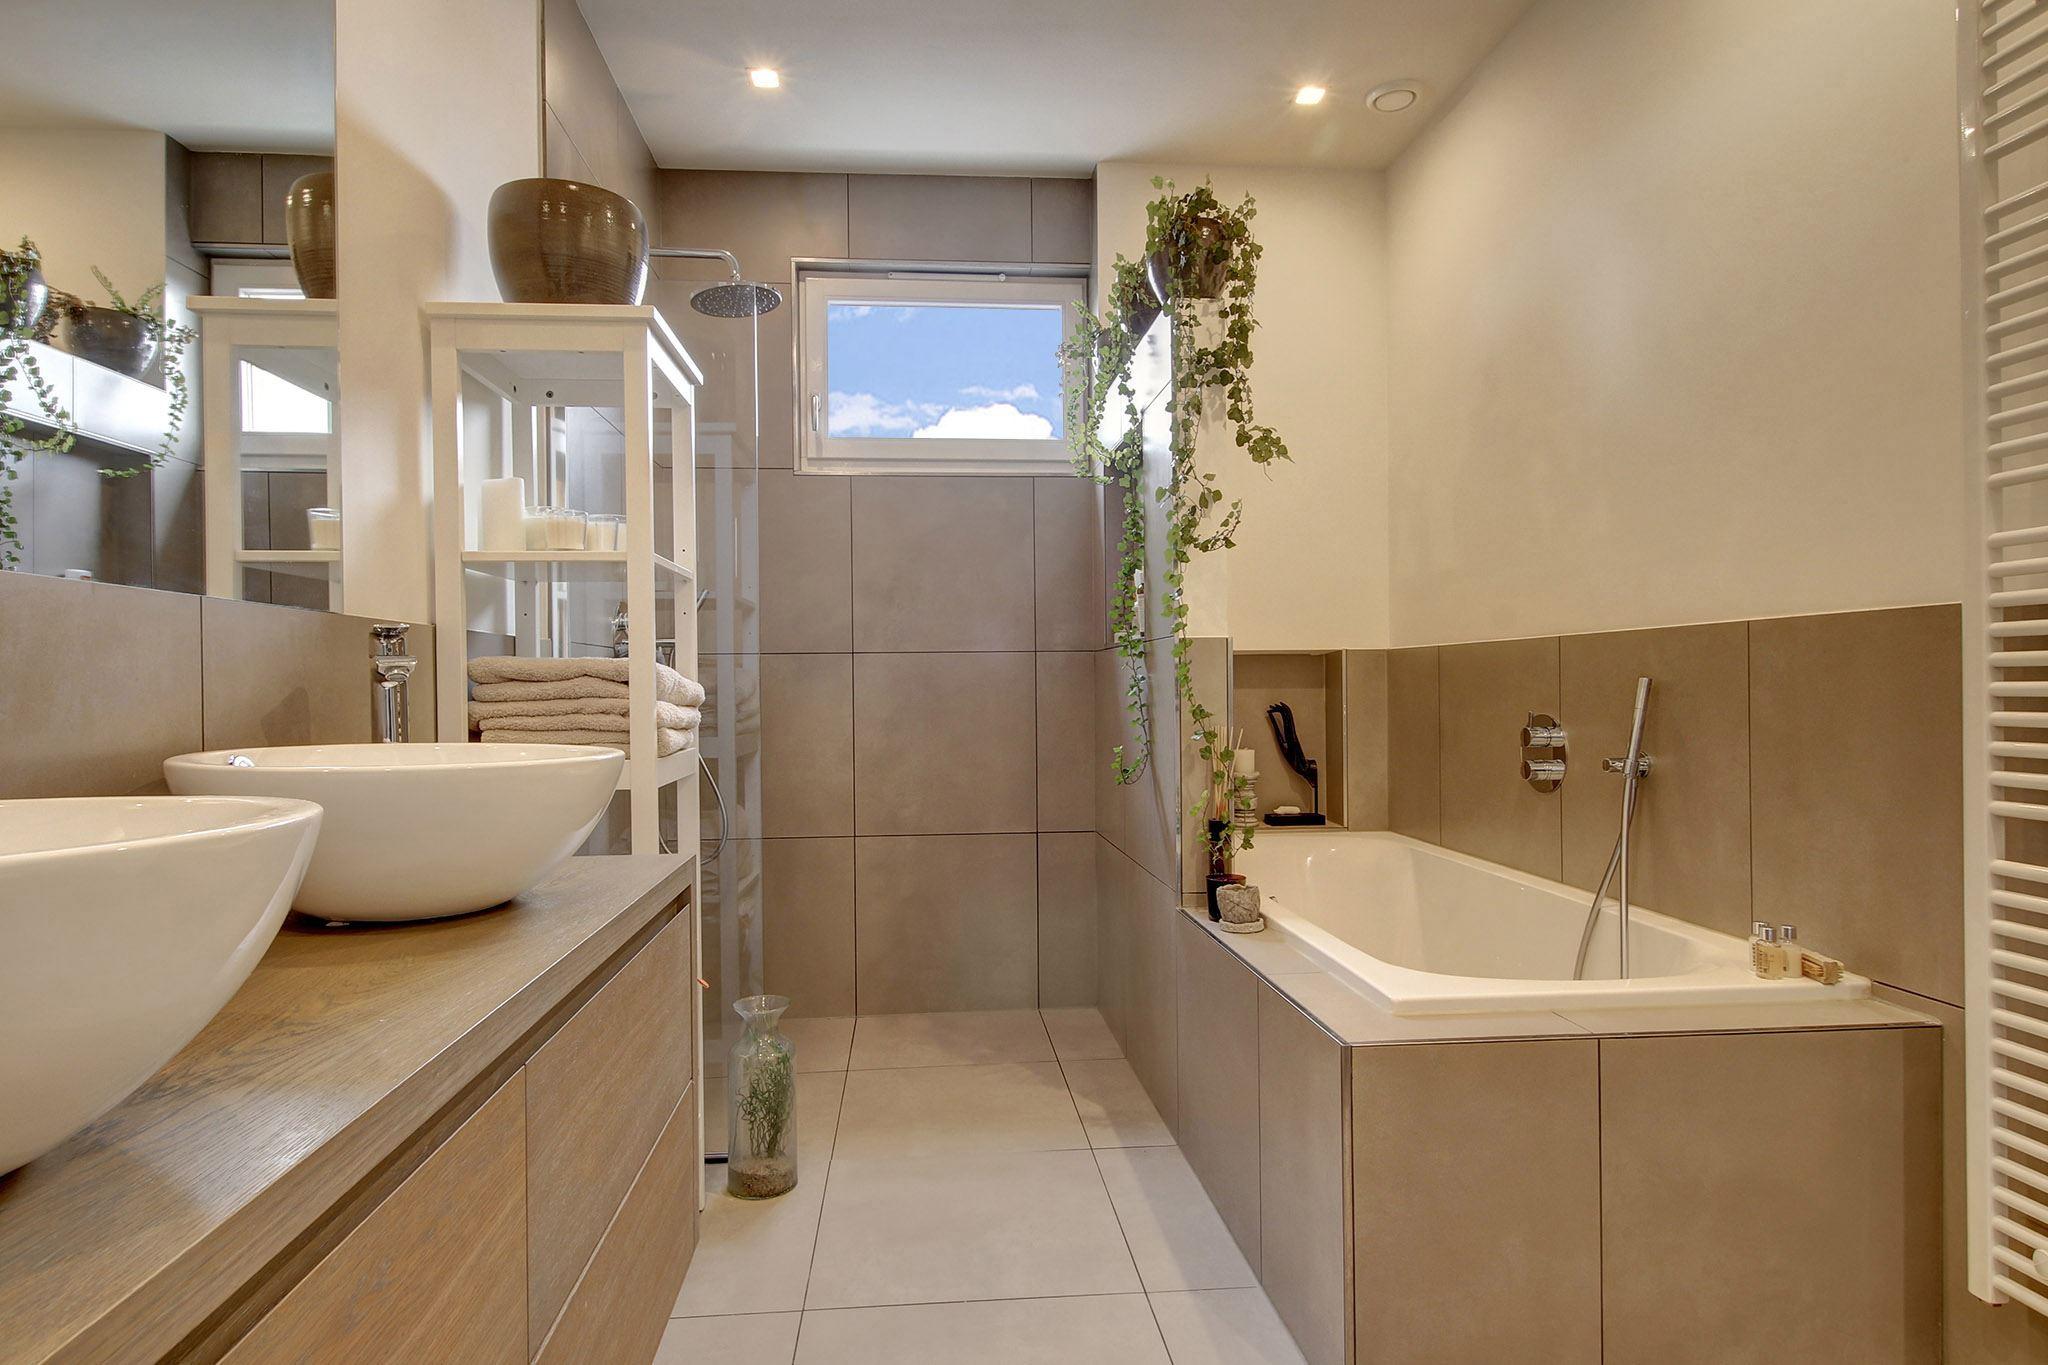 ванная комната душ двойная раковина комод полотенцесушитель ванна